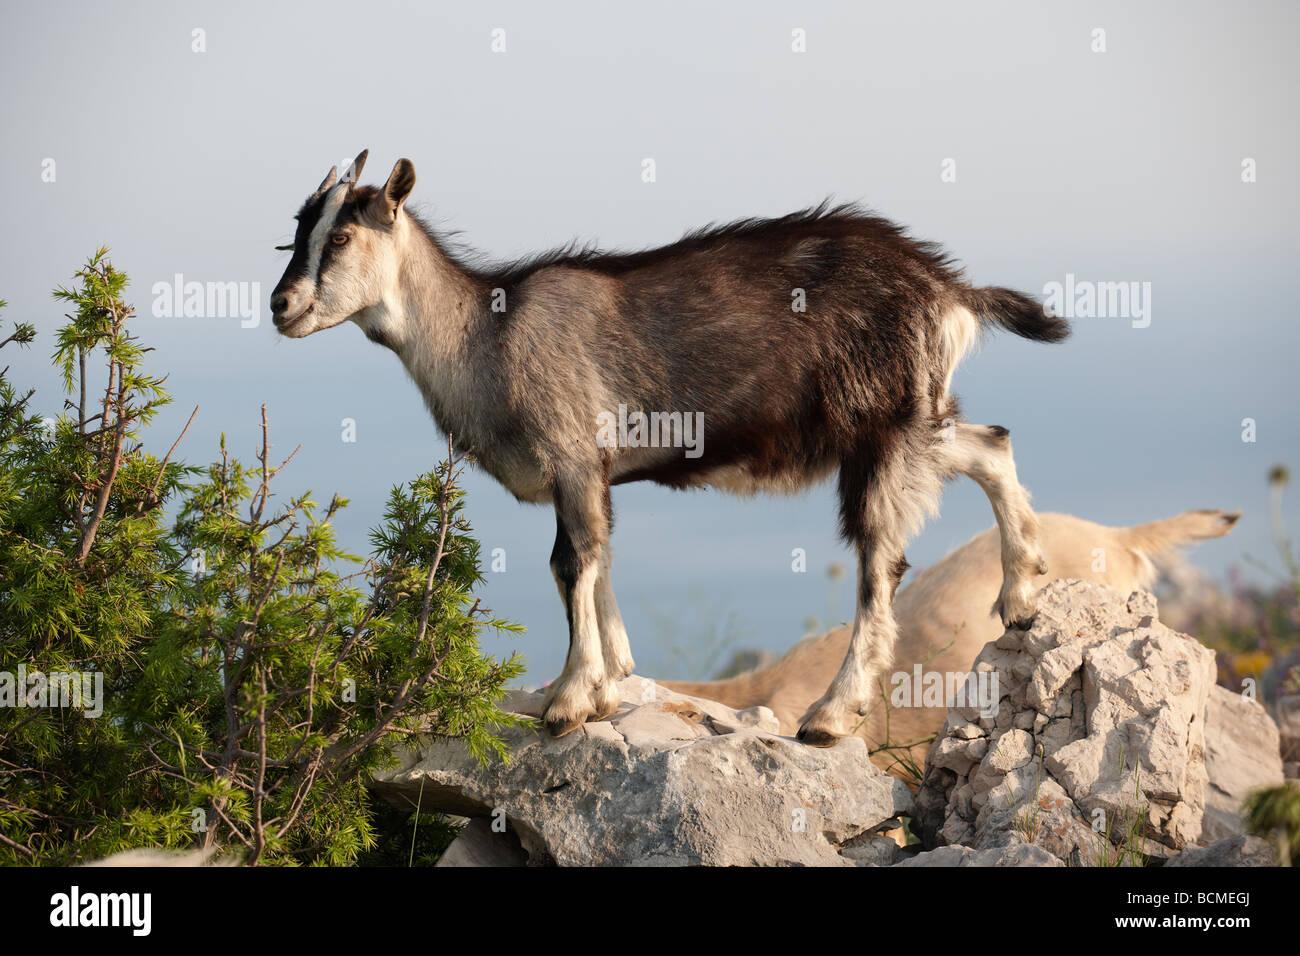 Mountain goats in the Dalamtian hills - Dubrovnik, Croatia - Stock Image